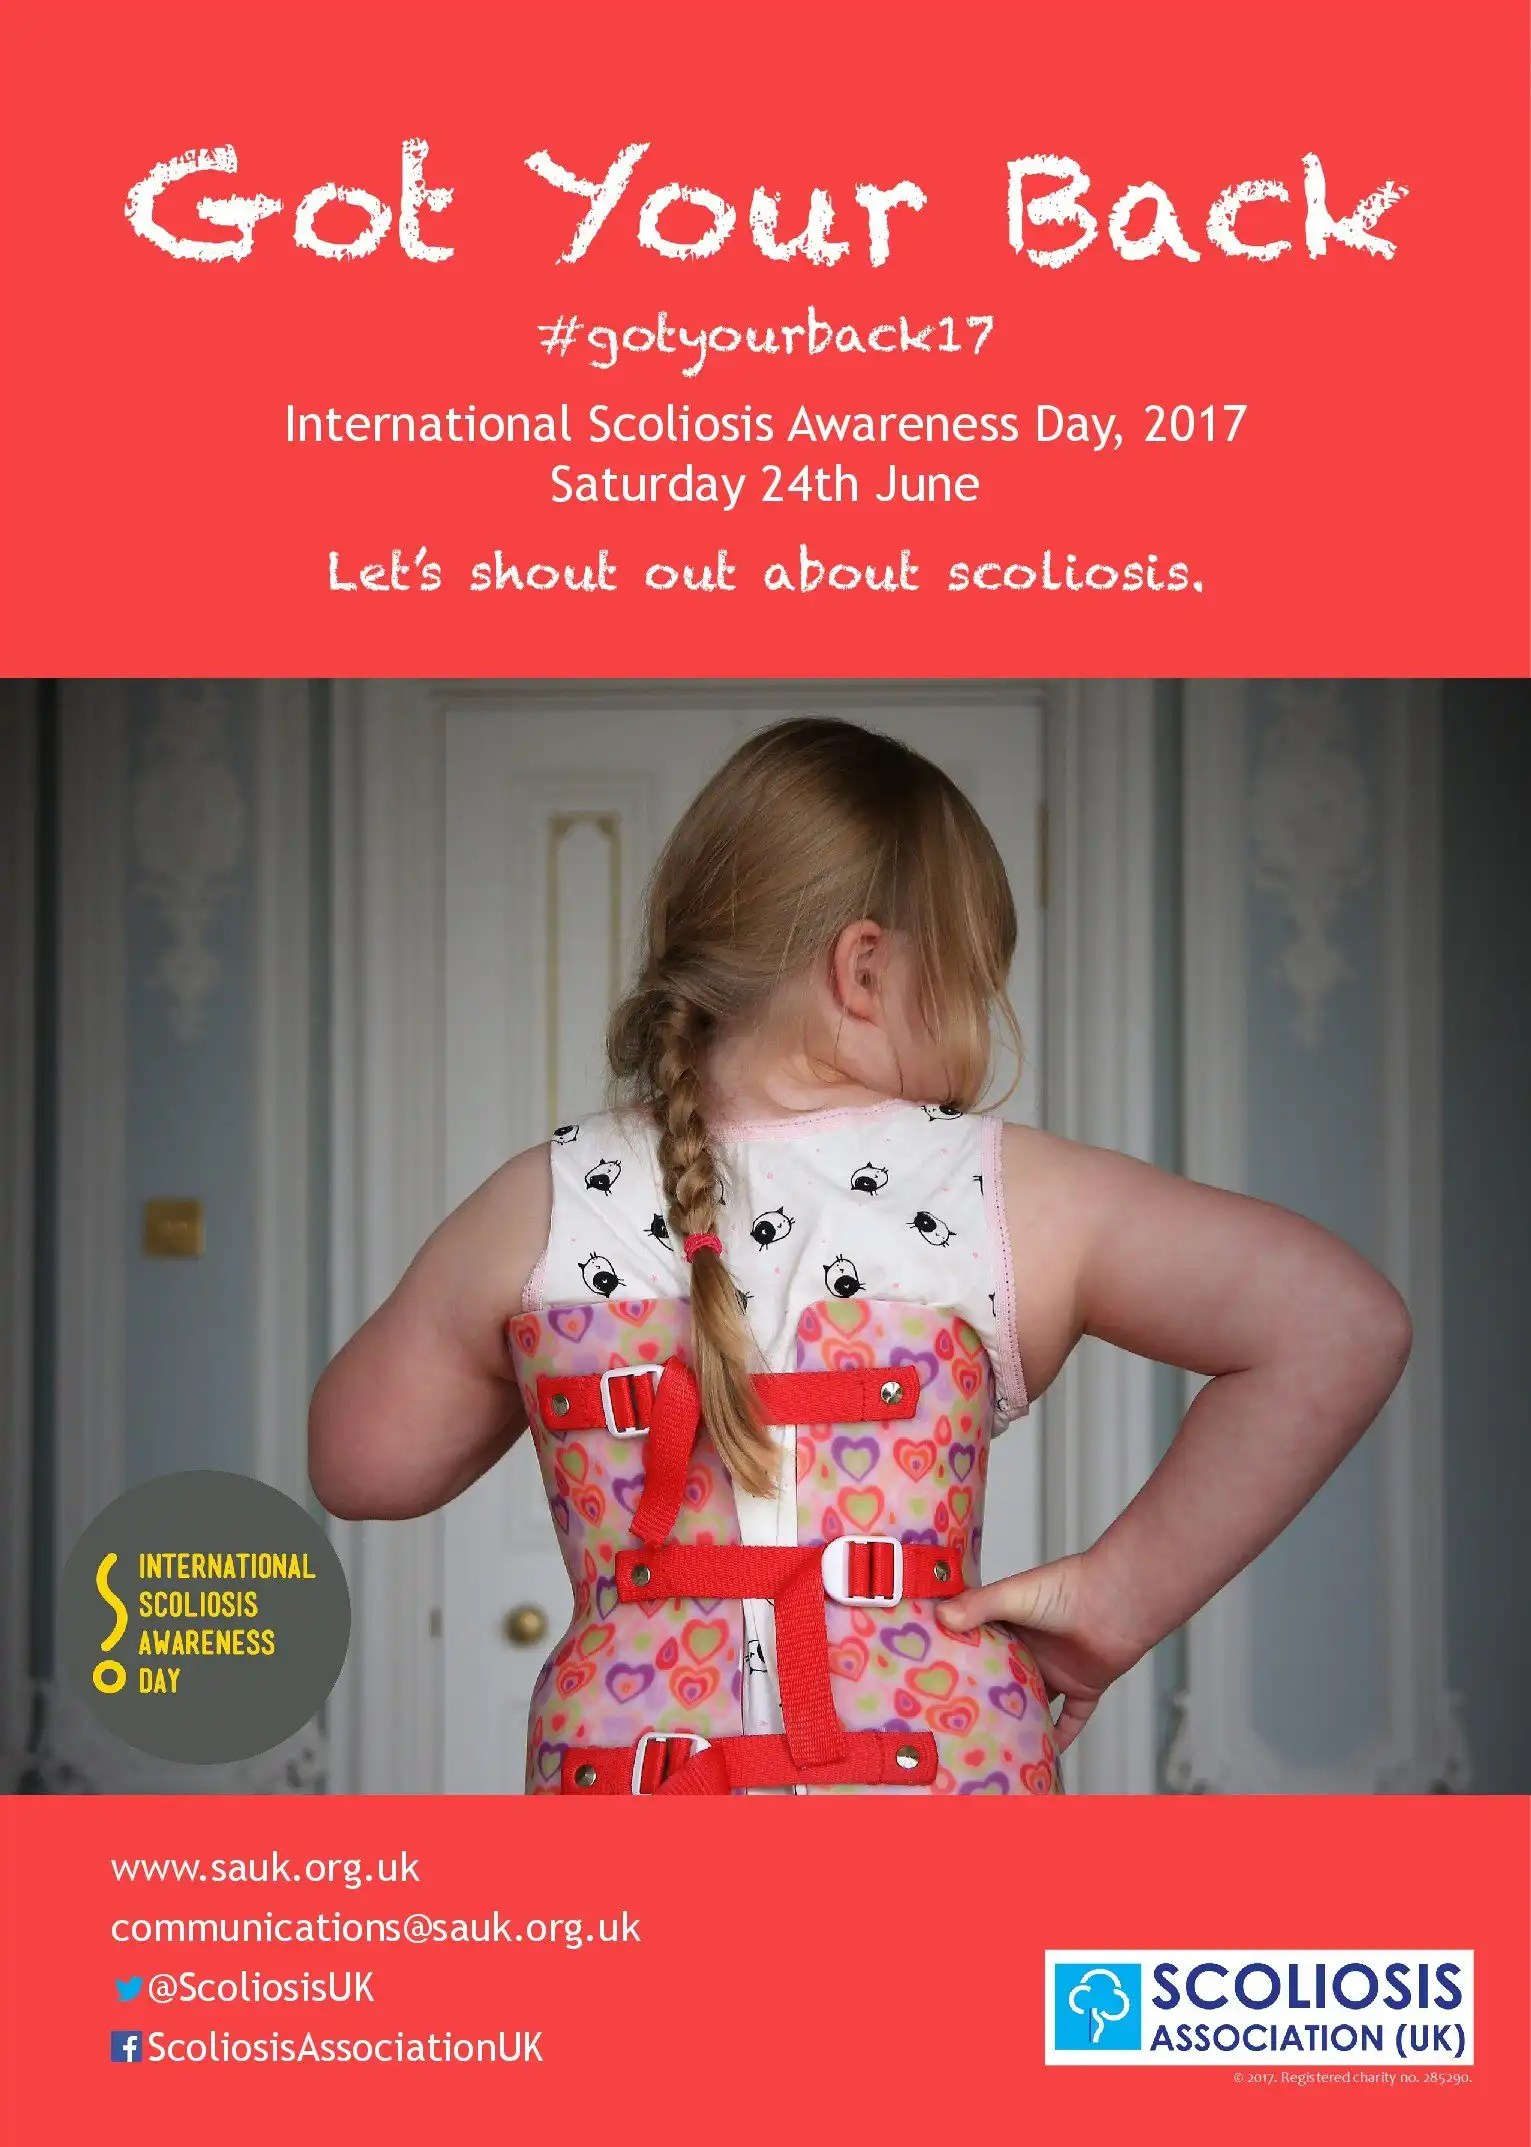 International Scoliosis Awareness Day 2017